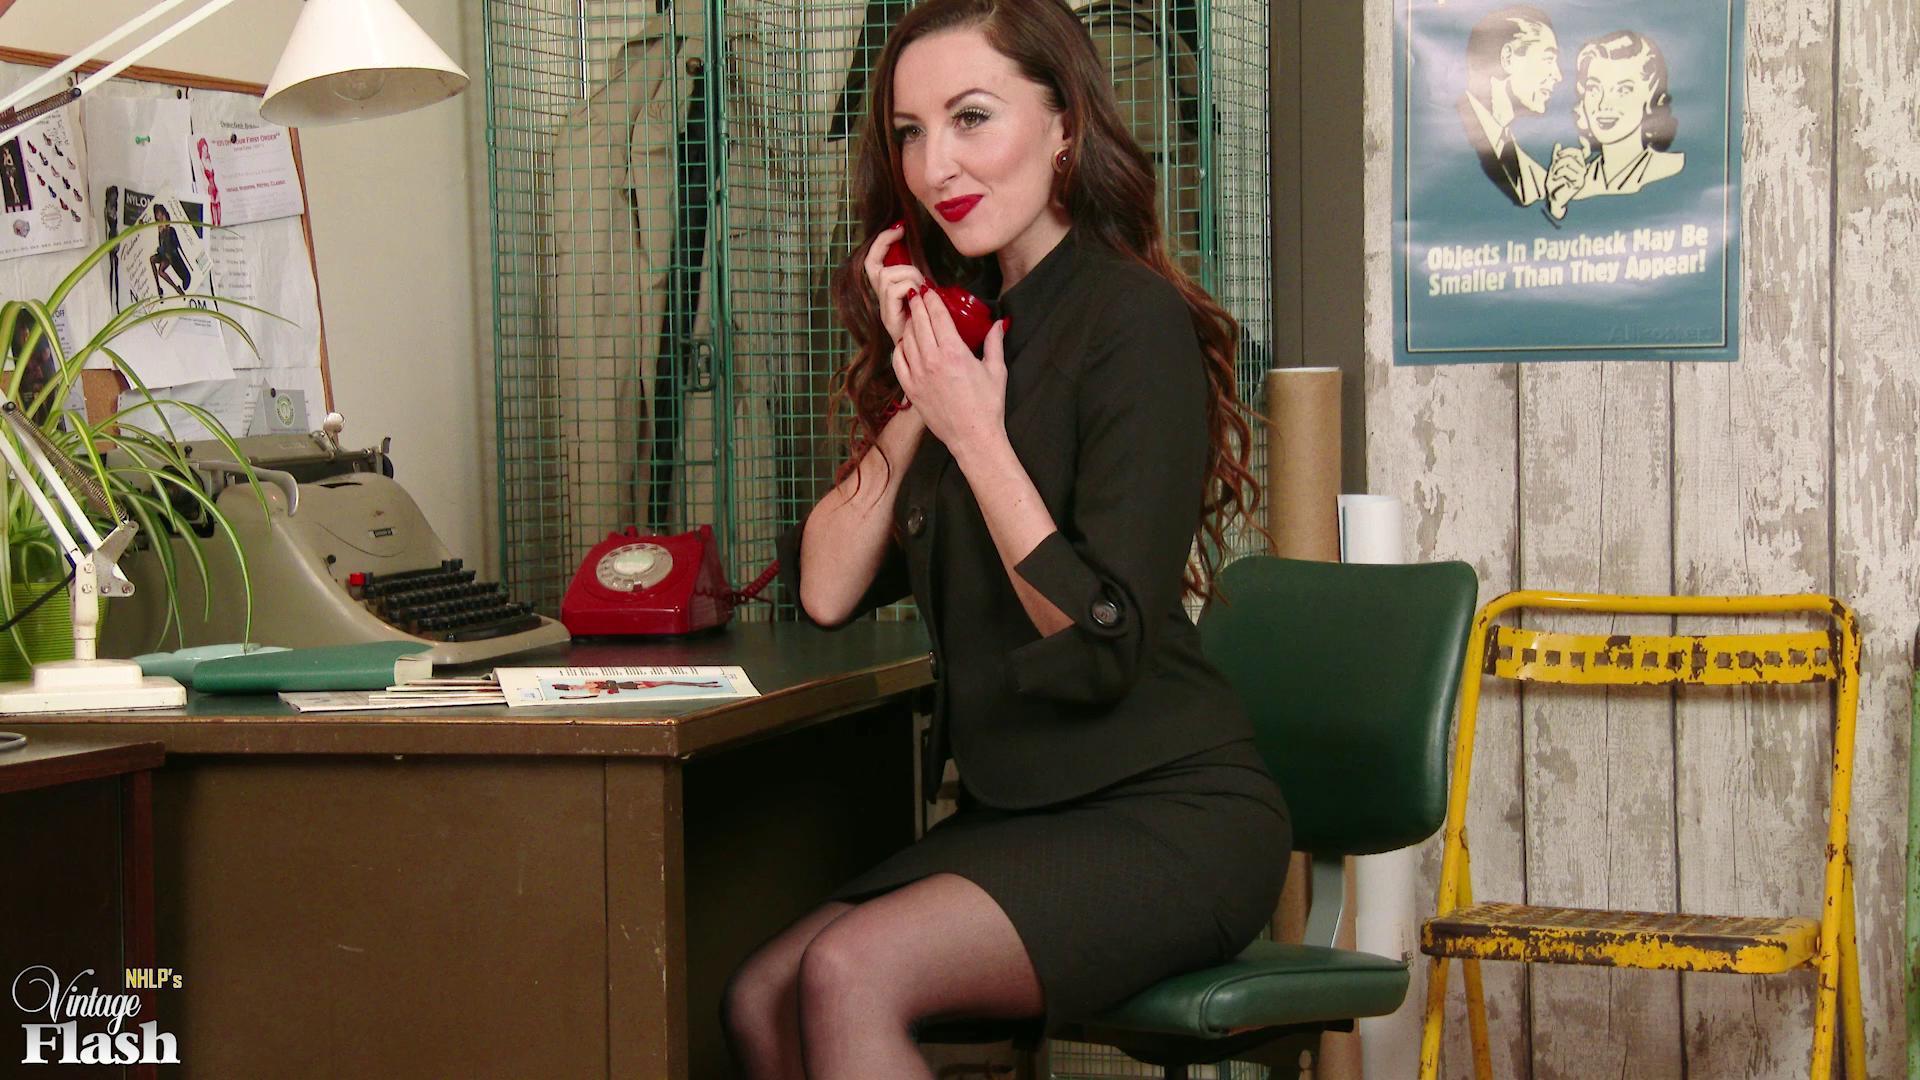 VintageFlash – Sophia Smith Customer Support